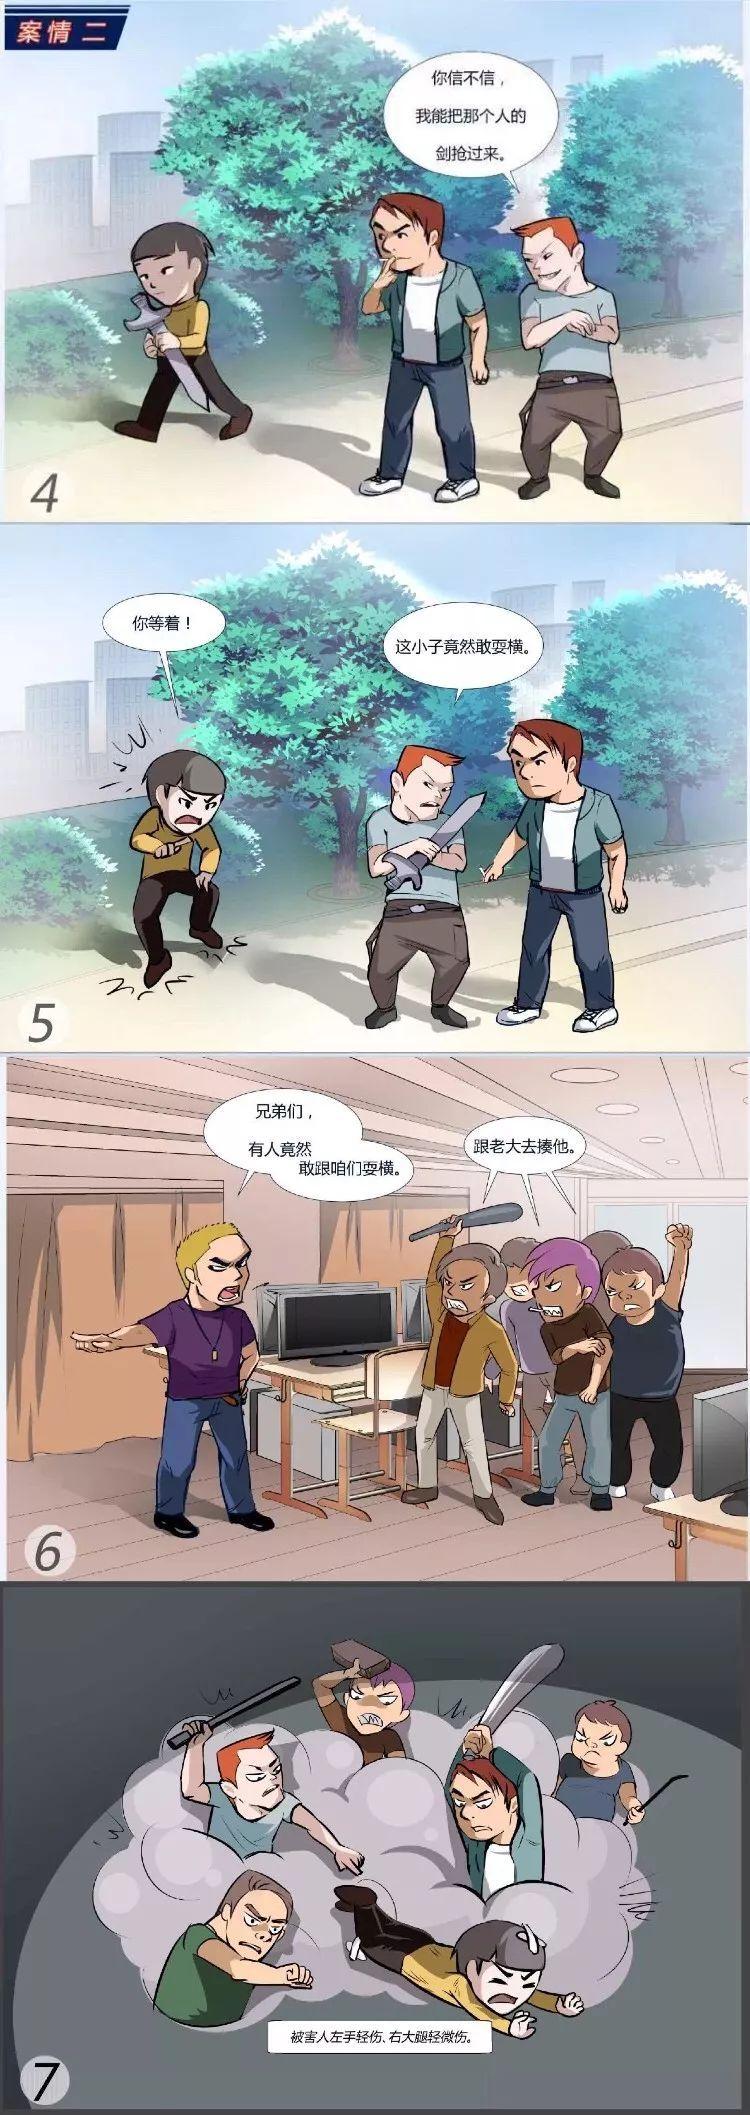 betway必威官网 12